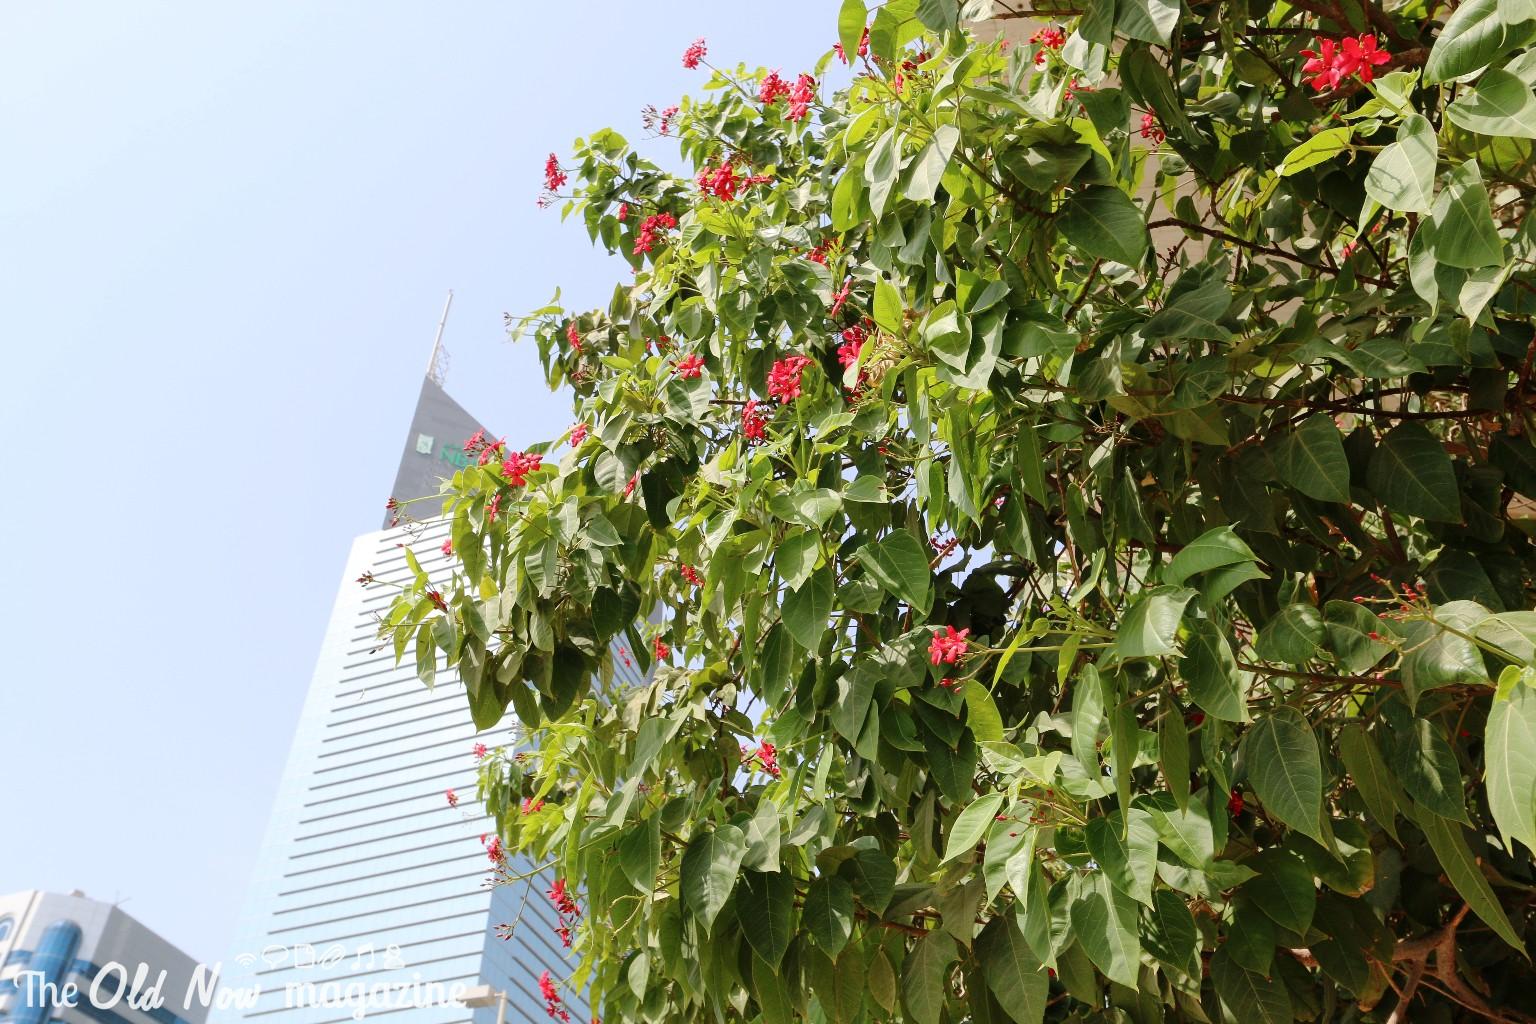 Abu Dhabi THEOLDNOW DAY 1 (5)